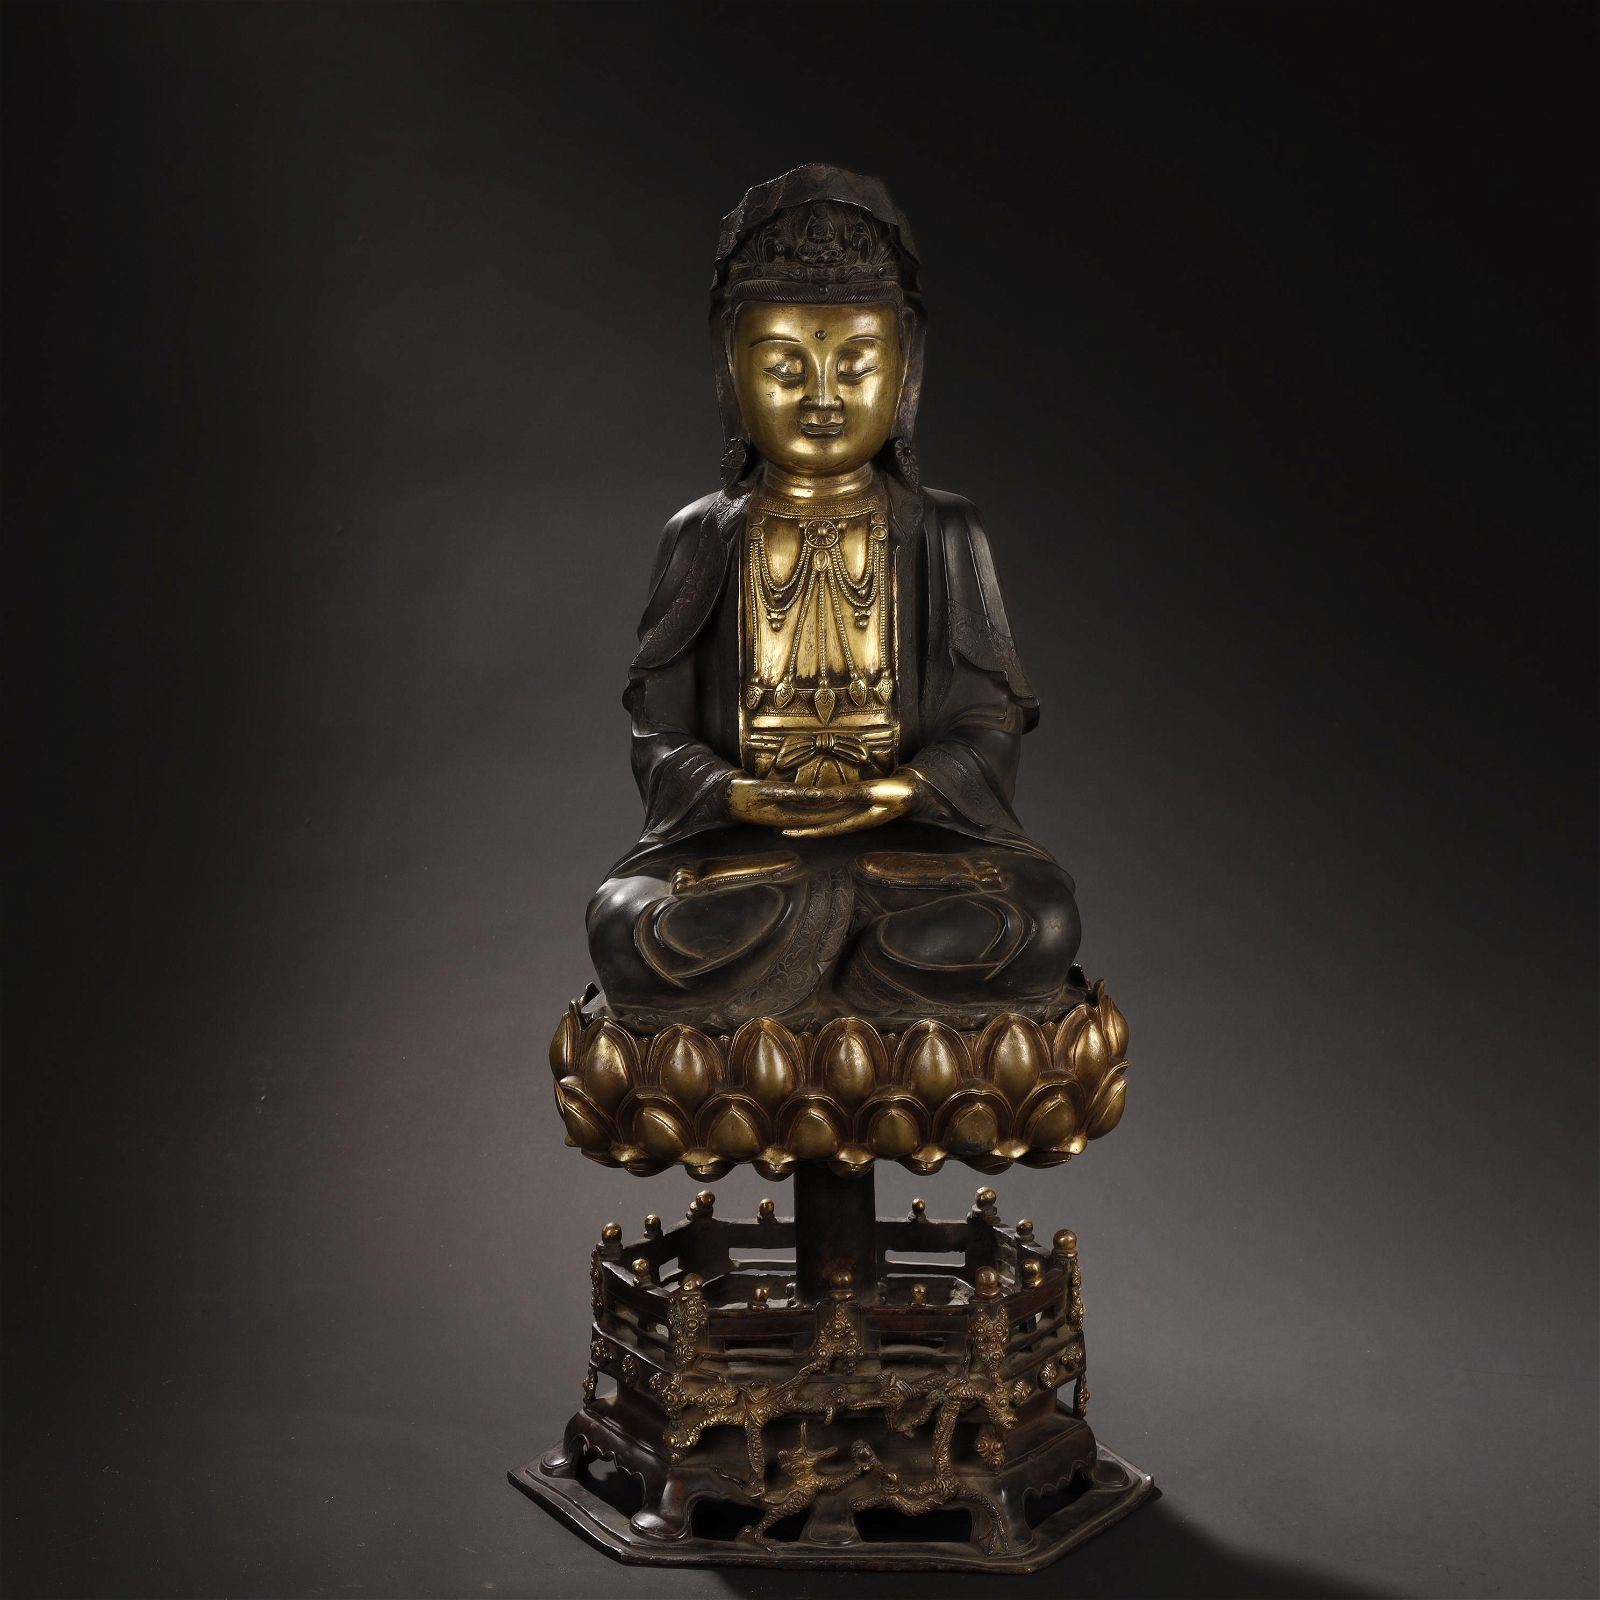 MING DYNASTY GILT-BRONZE BUDDHA STATUE